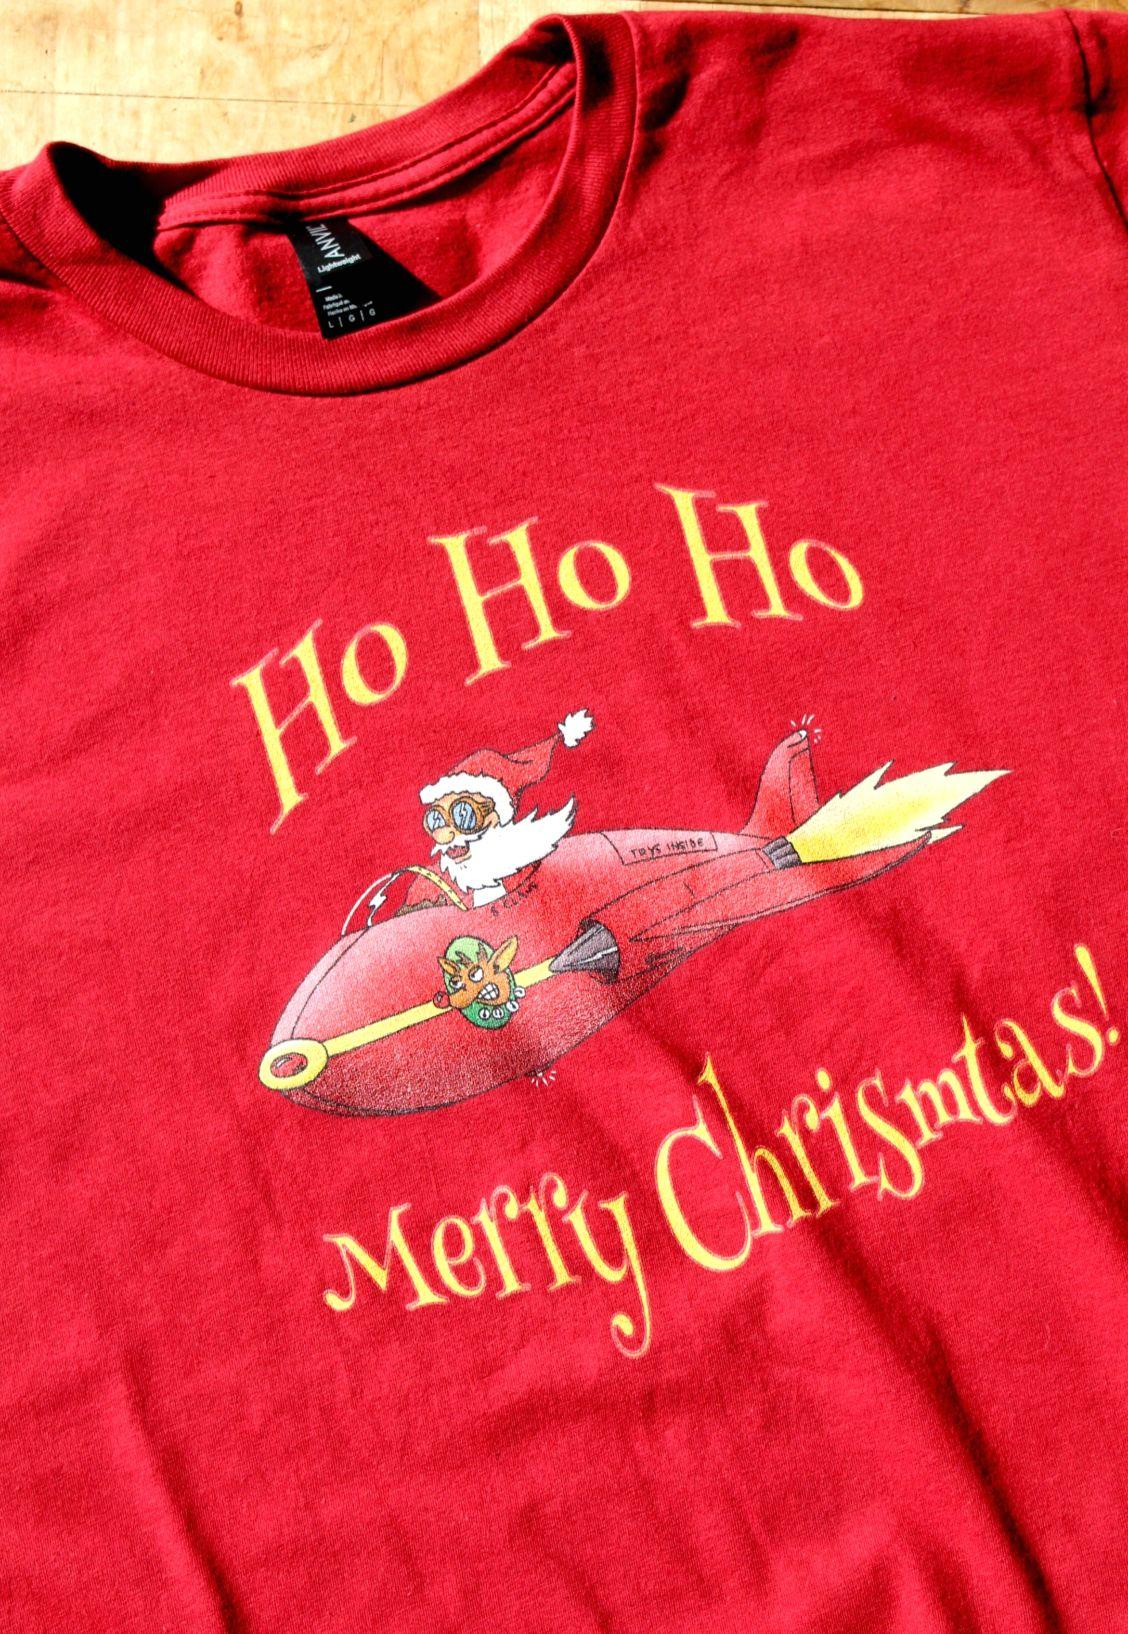 Black keys t shirt etsy - Santa In A Jet Christmas T Shirt From Jimmo Designs